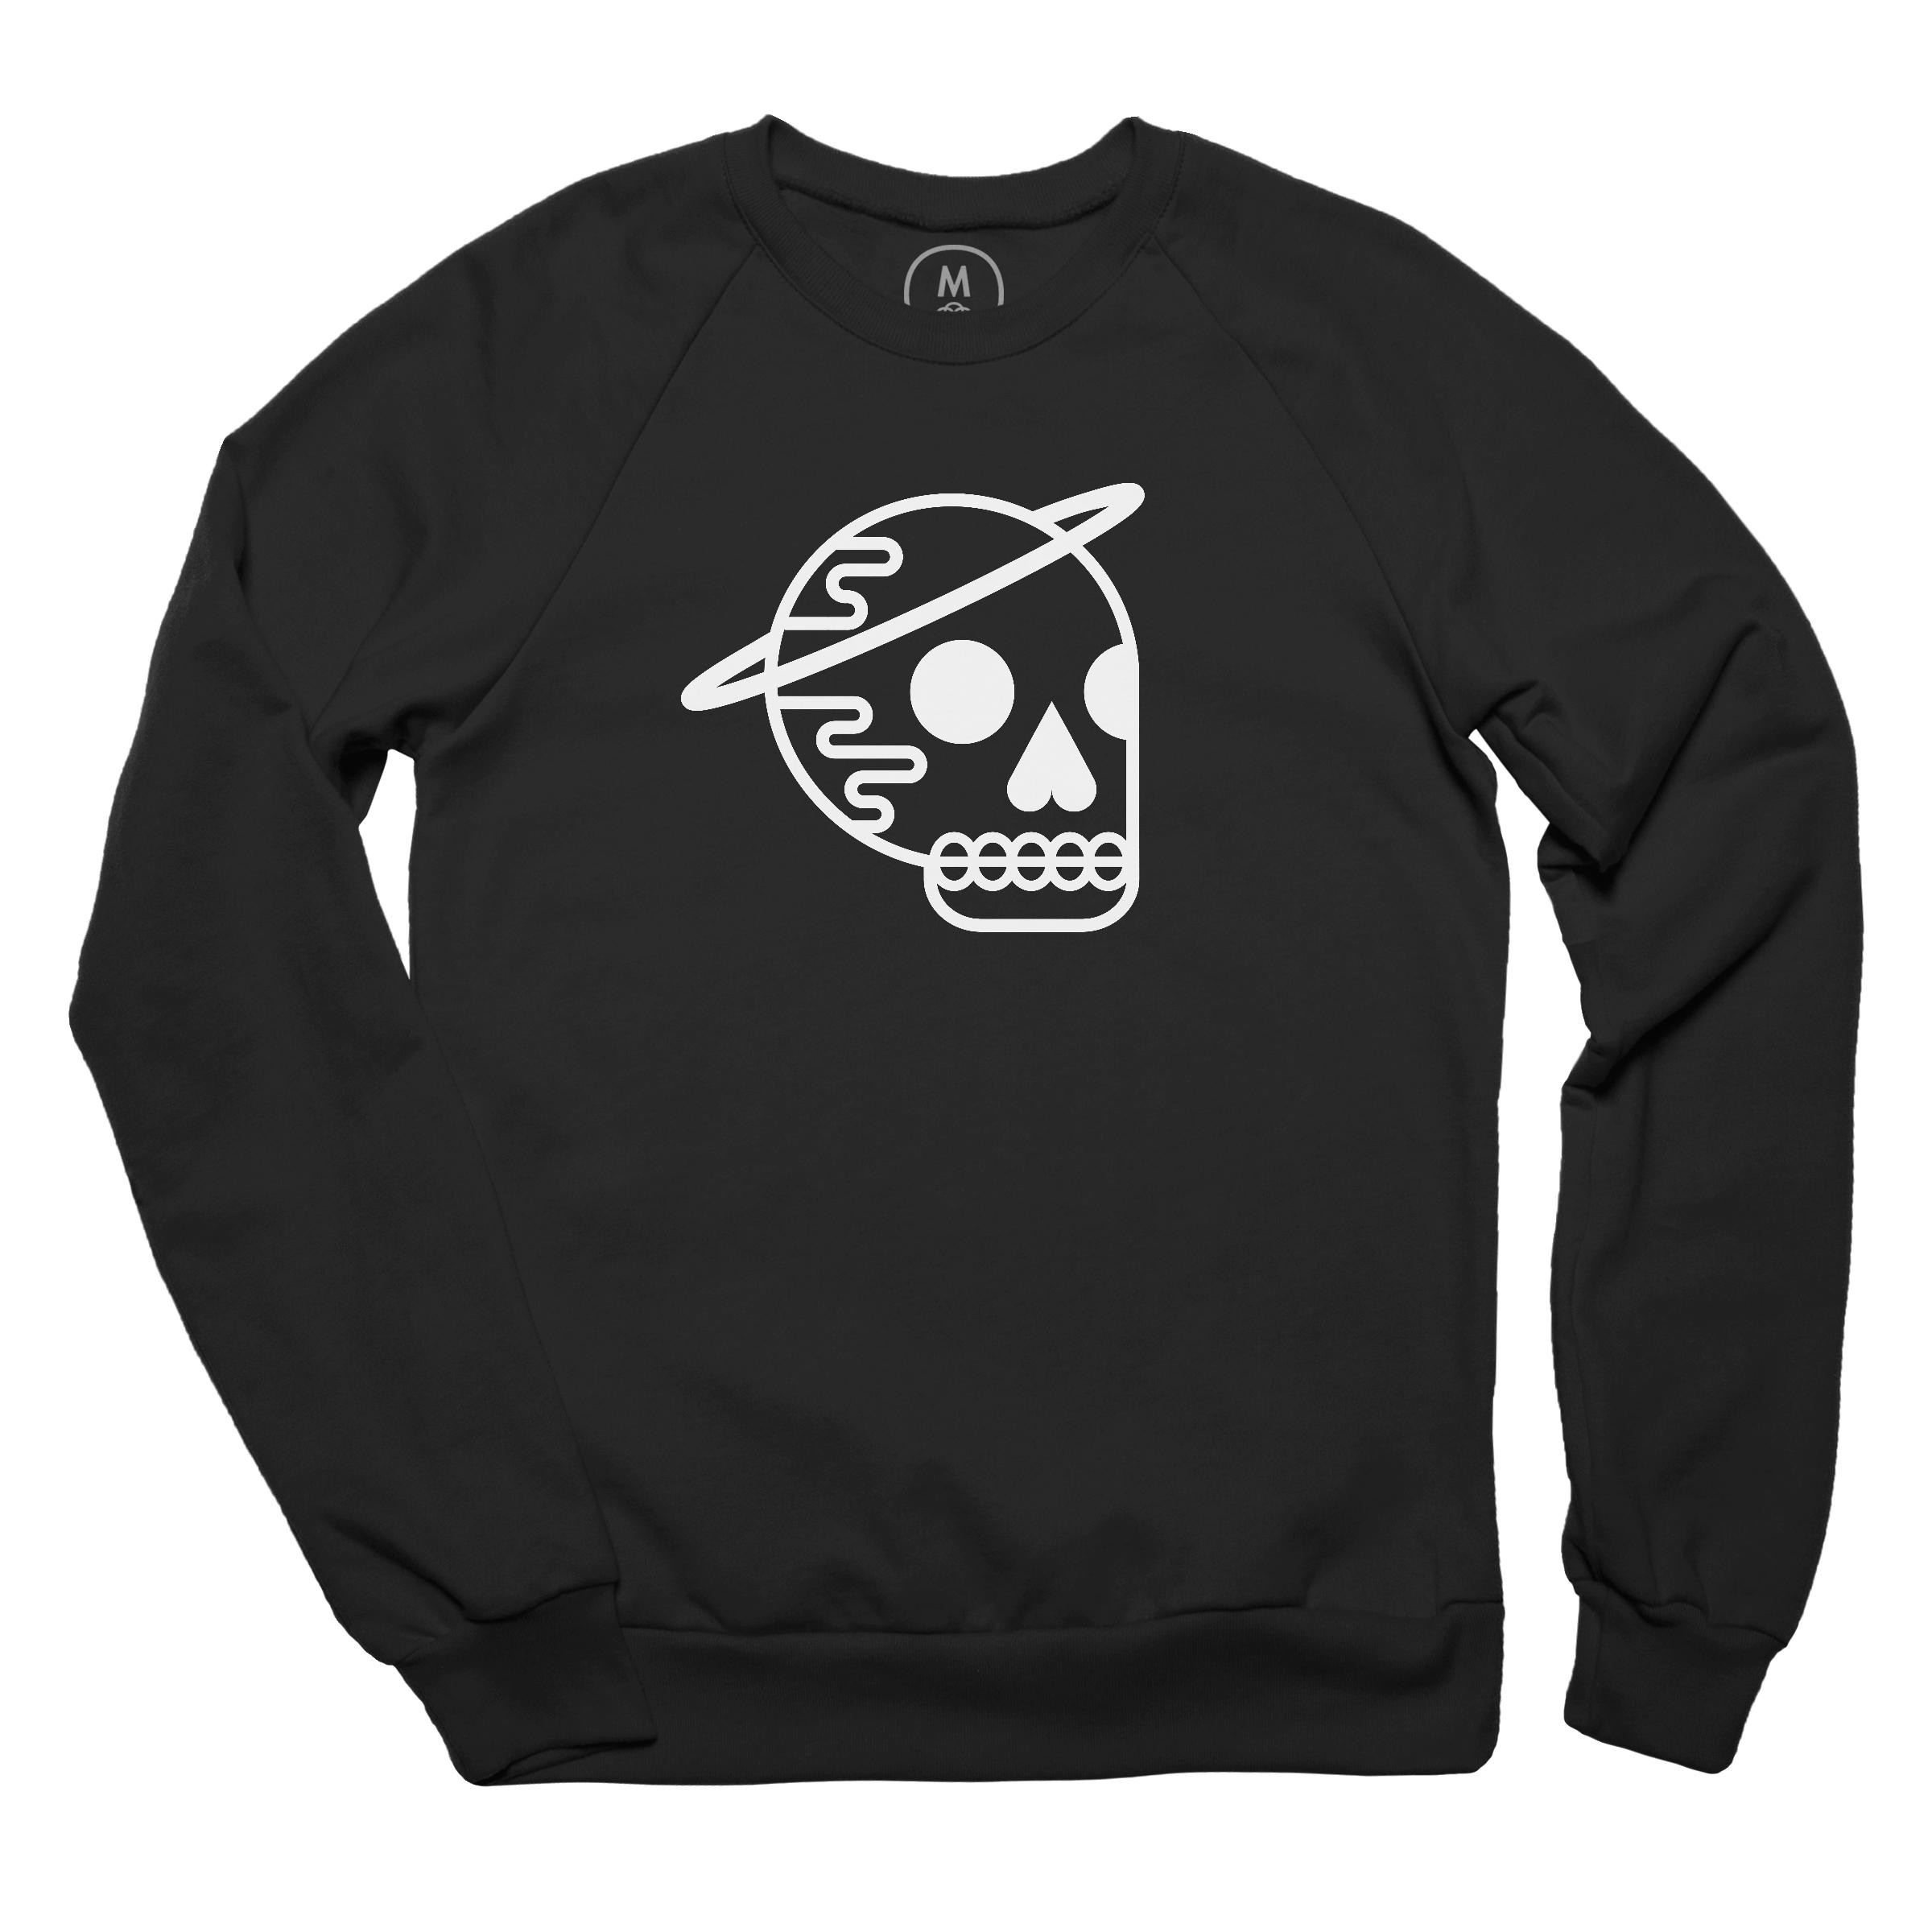 HASKU (Halo Skull) Pullover Crewneck